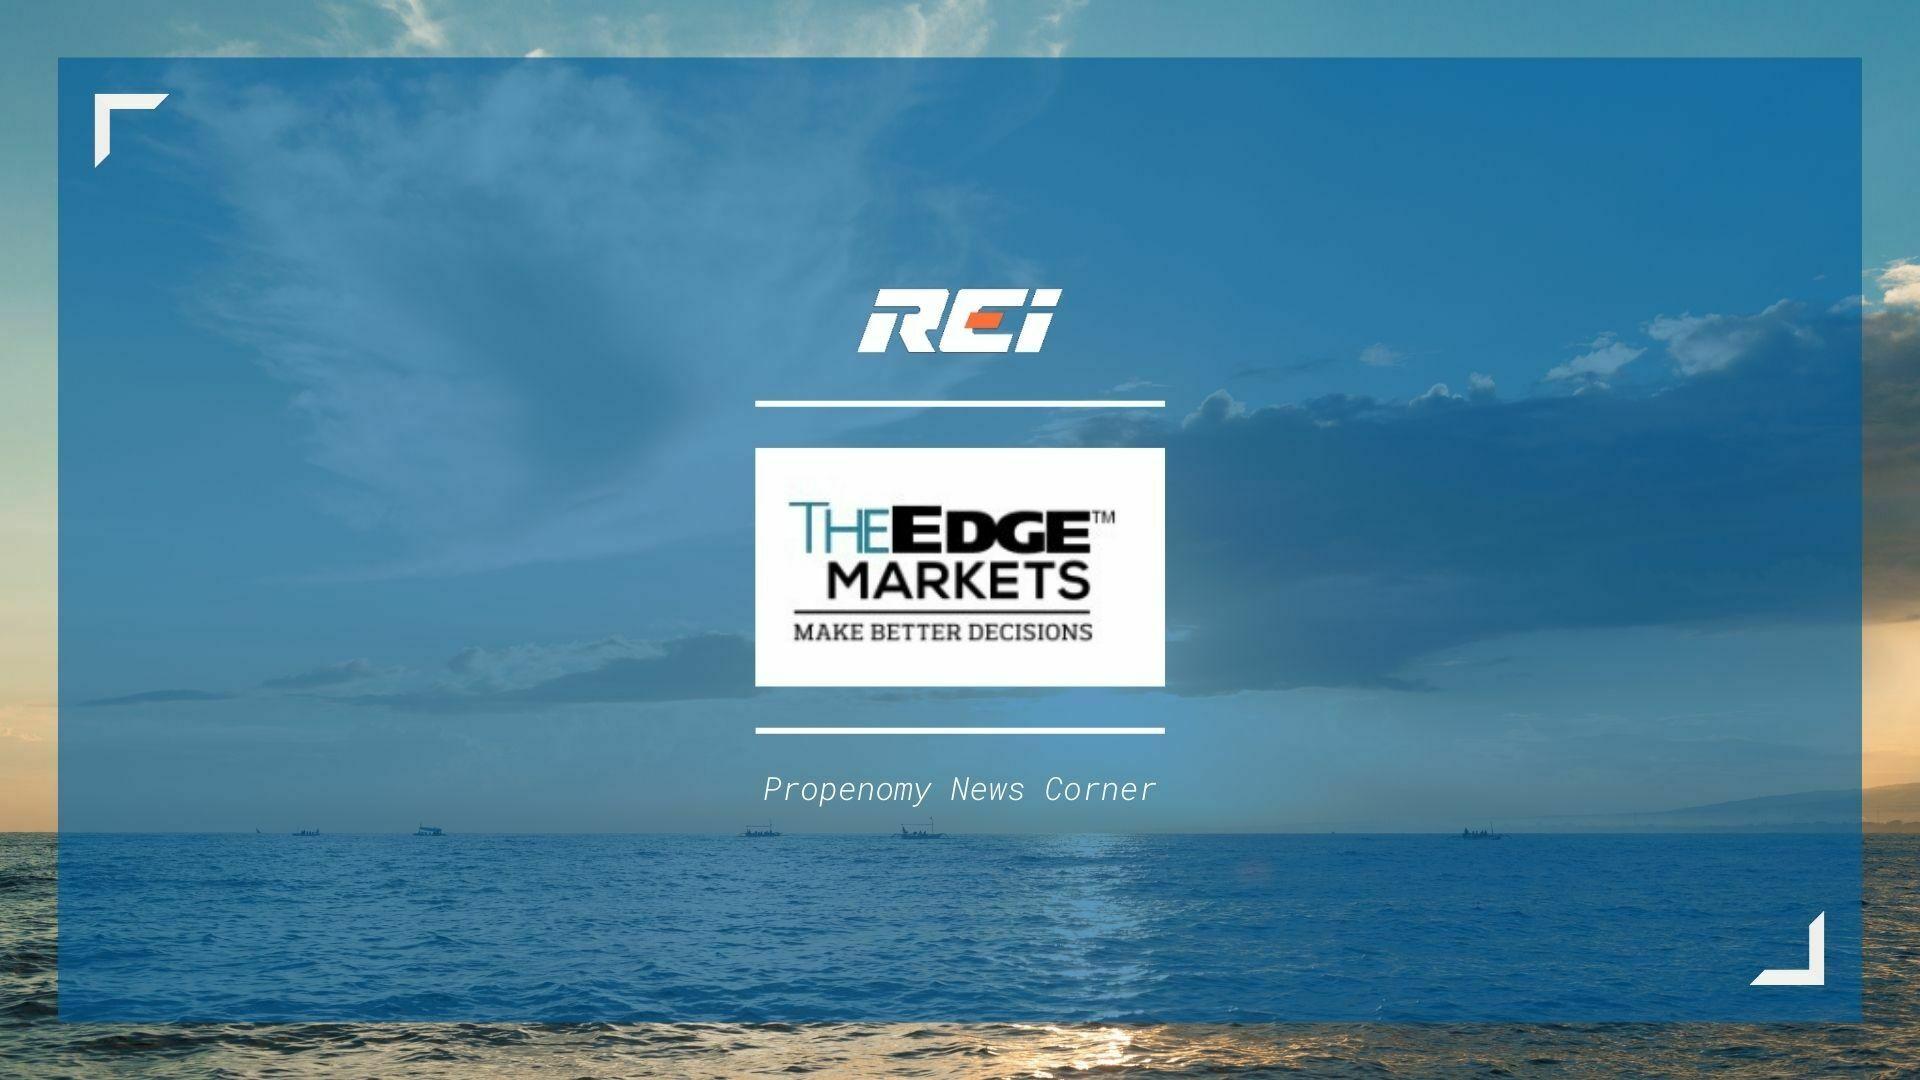 Propenomy News Corner-TheEdge Market